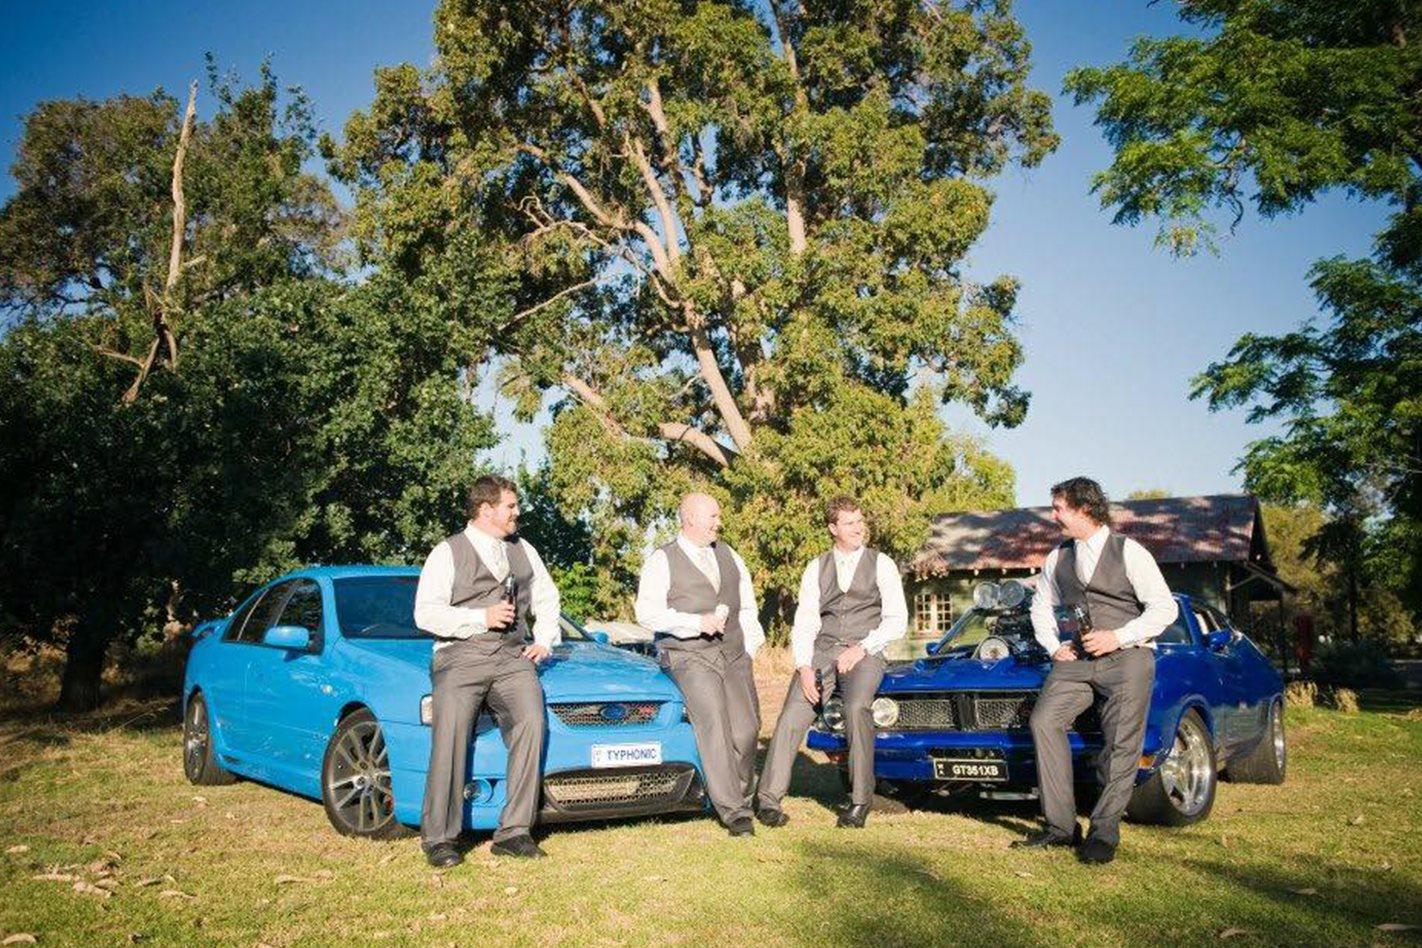 Chris Nardini's wedding cars